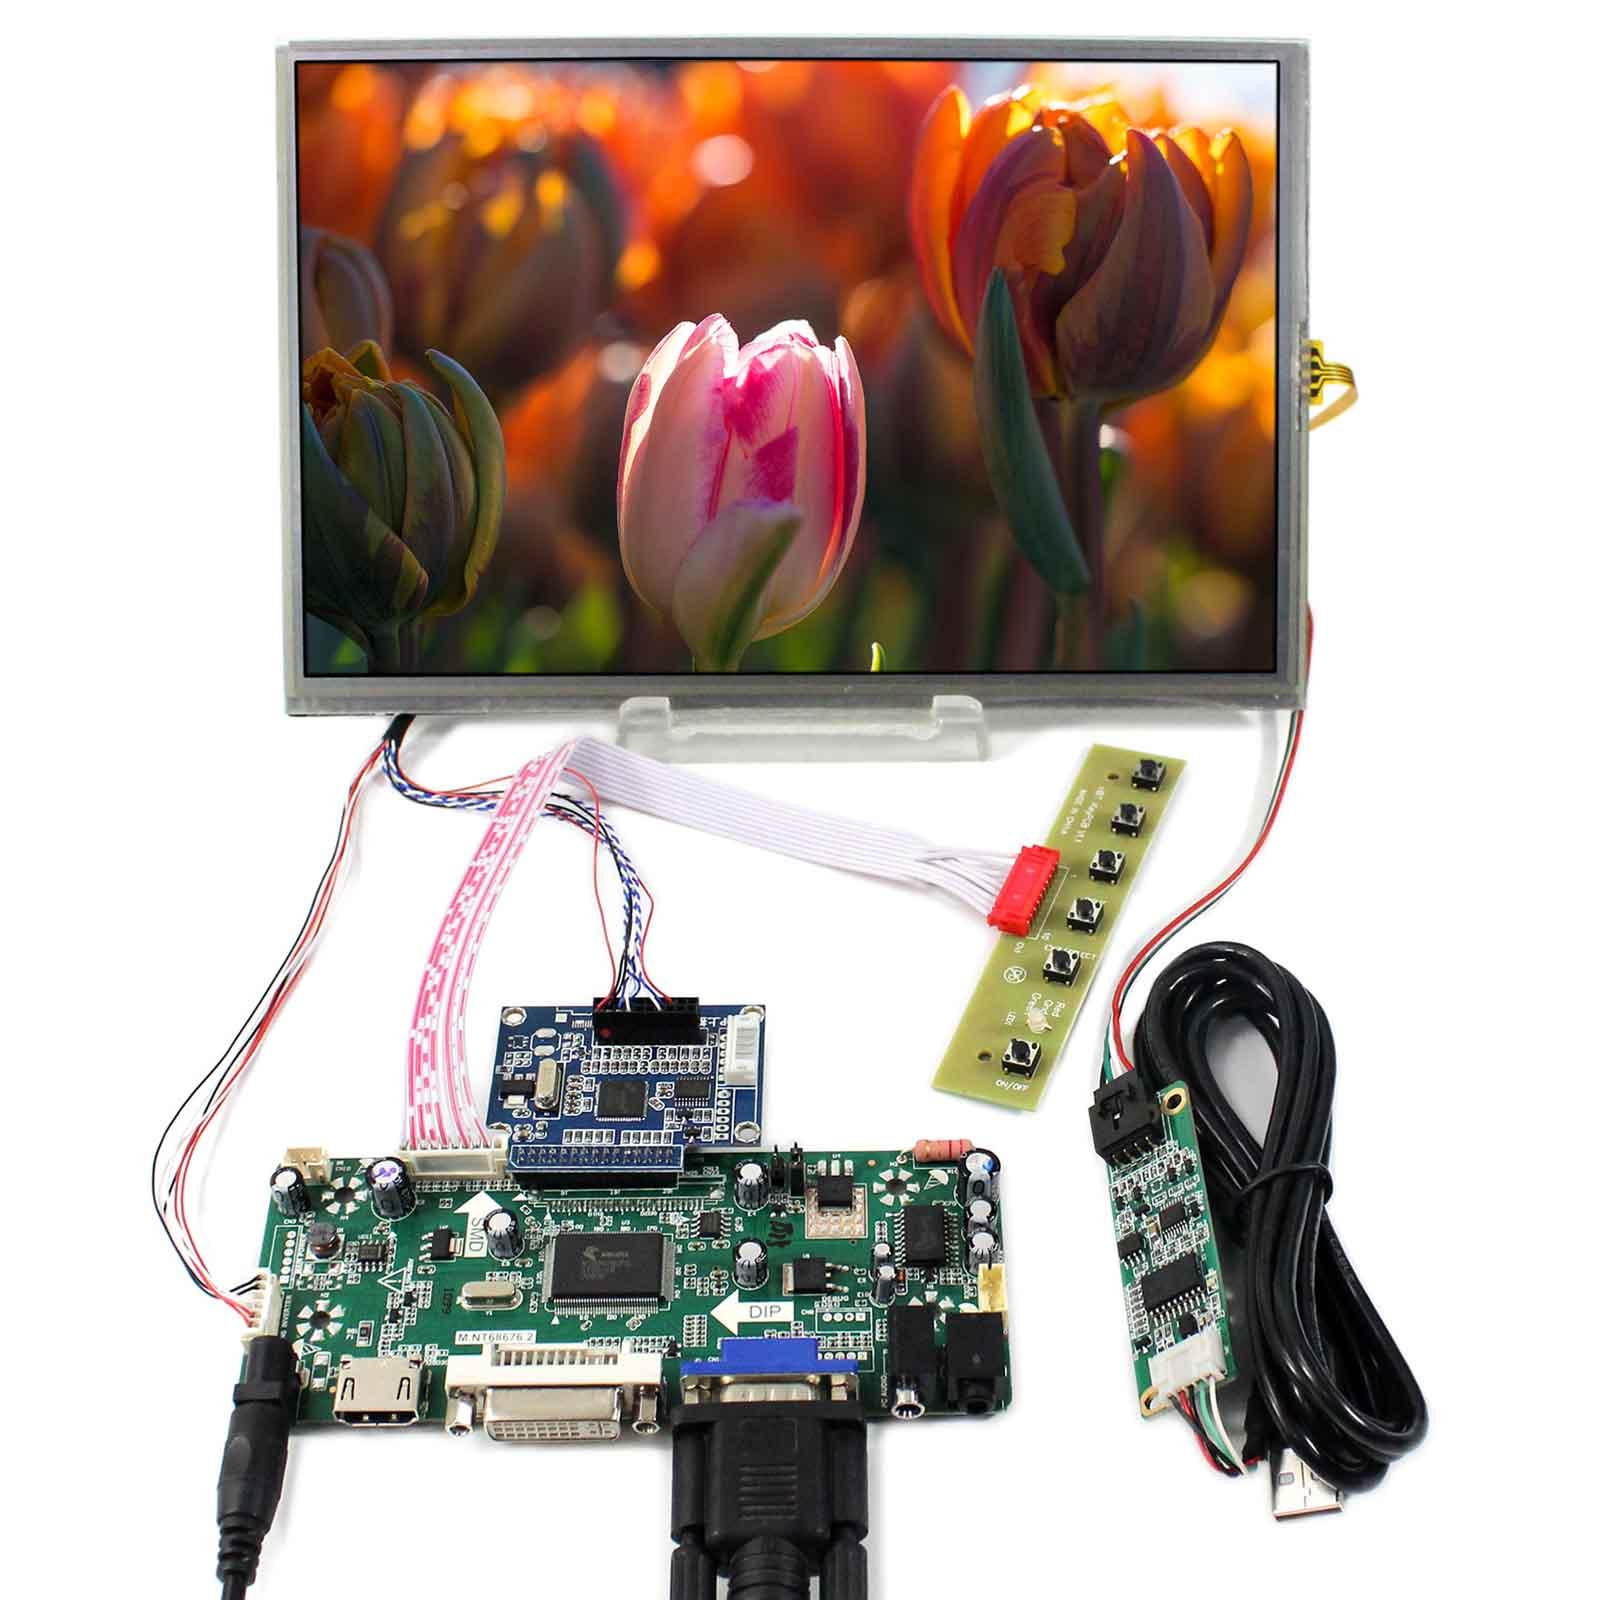 HDMI+VGA+DVI+Audio Controller Board With 1920x1200 10.1inch B101UAN01.A Resistive Touch PanelHDMI+VGA+DVI+Audio Controller Board With 1920x1200 10.1inch B101UAN01.A Resistive Touch Panel